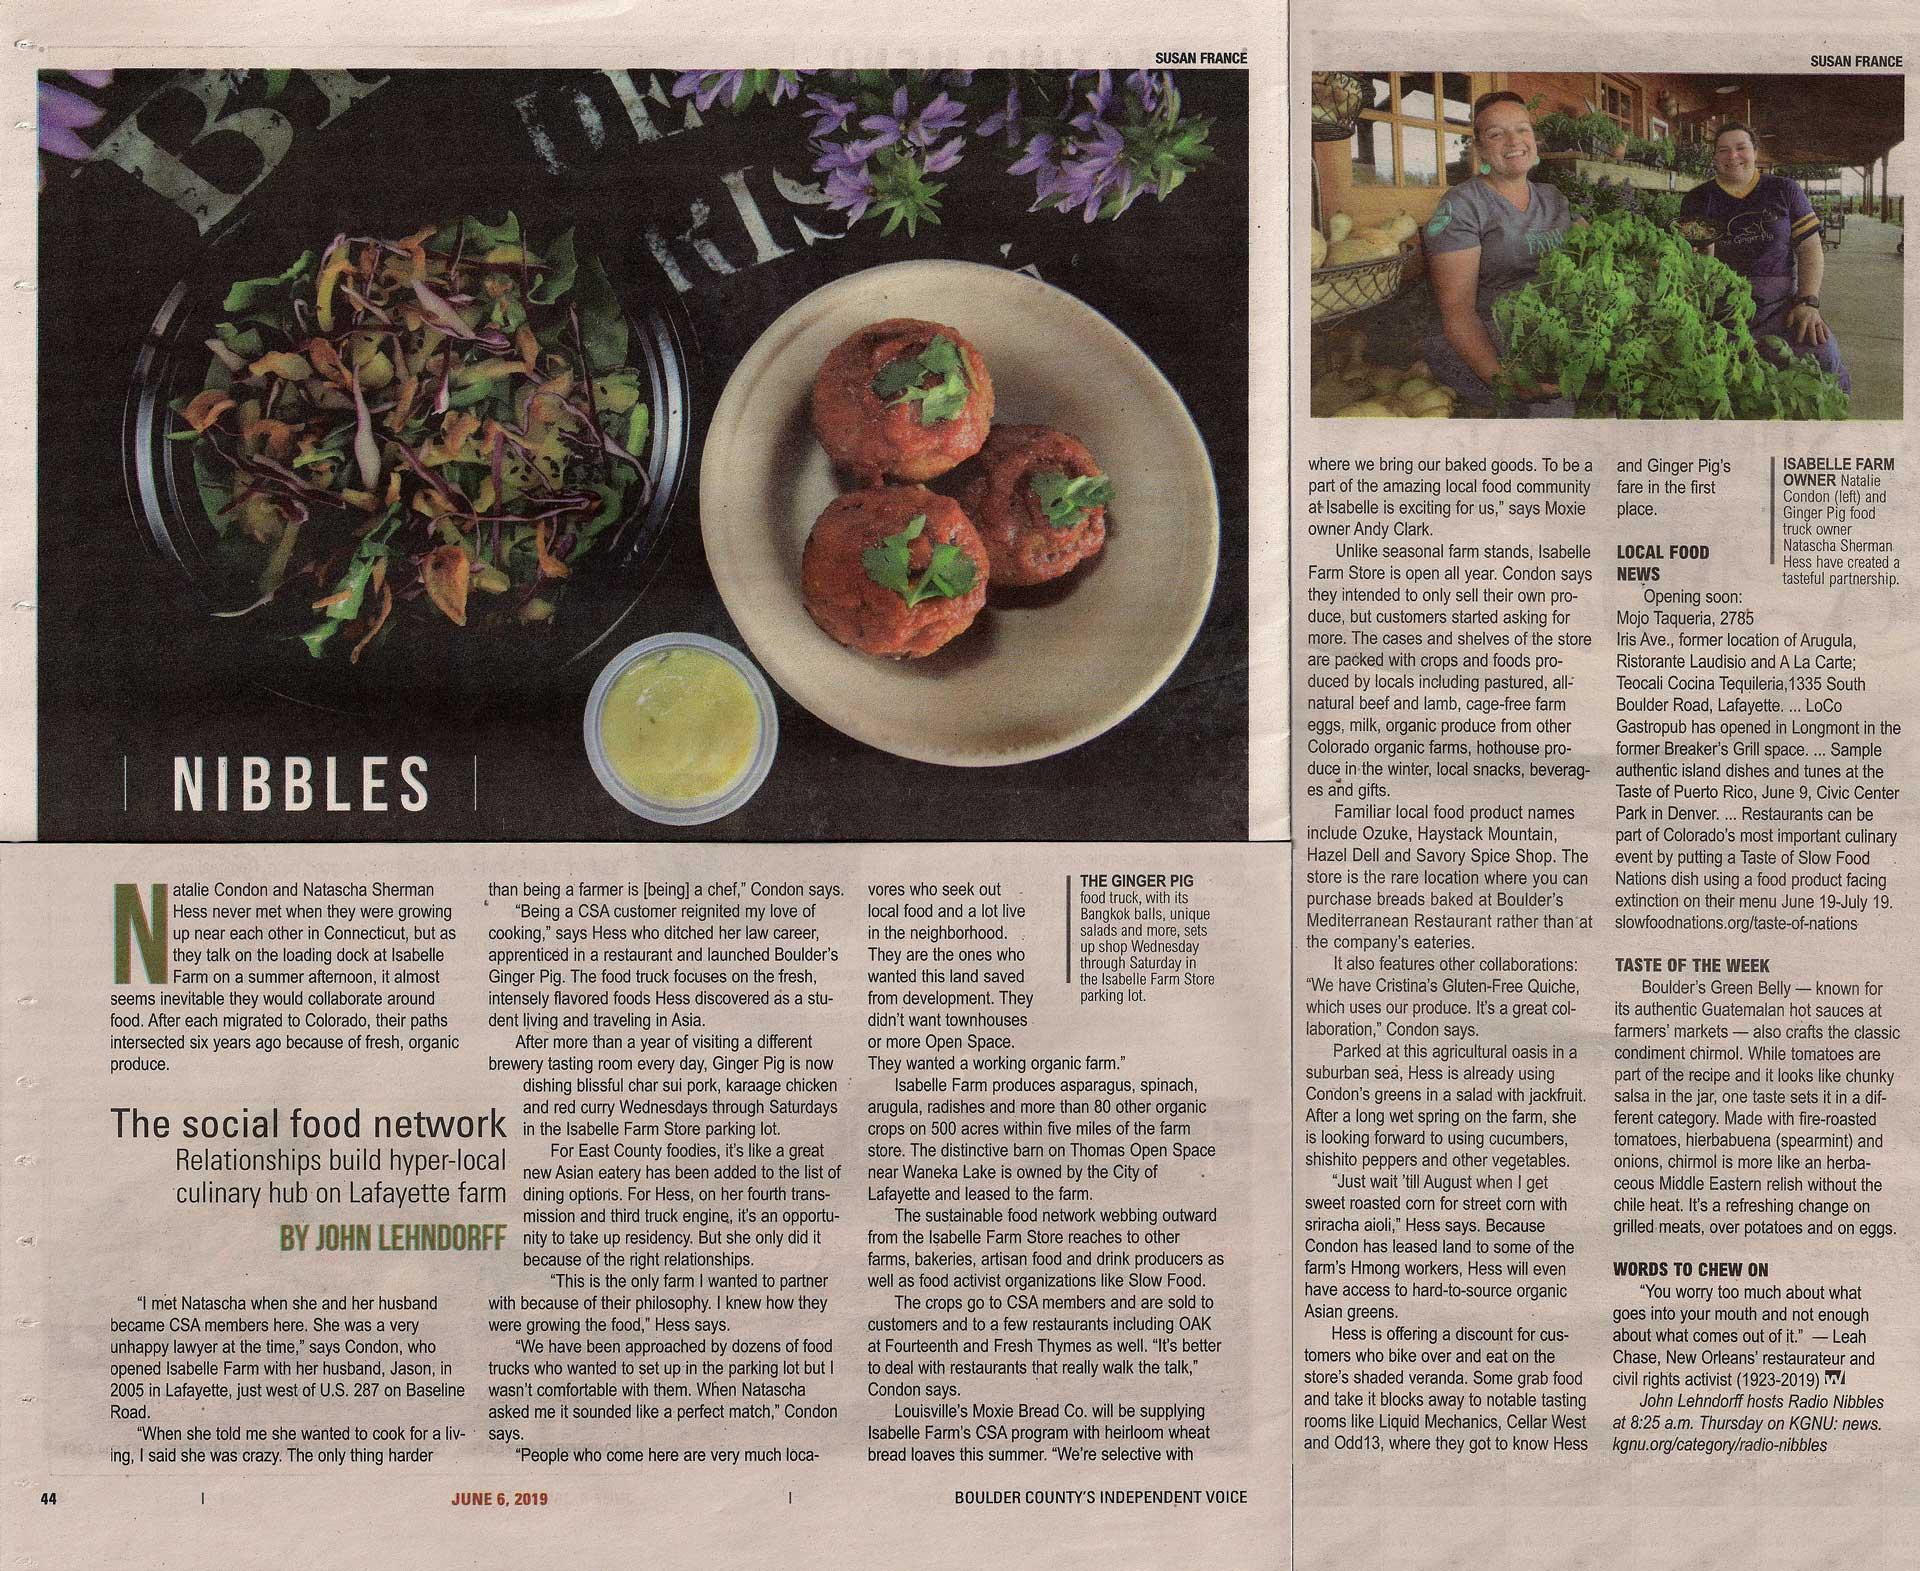 boulder-weekly-nibbles-isabelle-farm.jpg